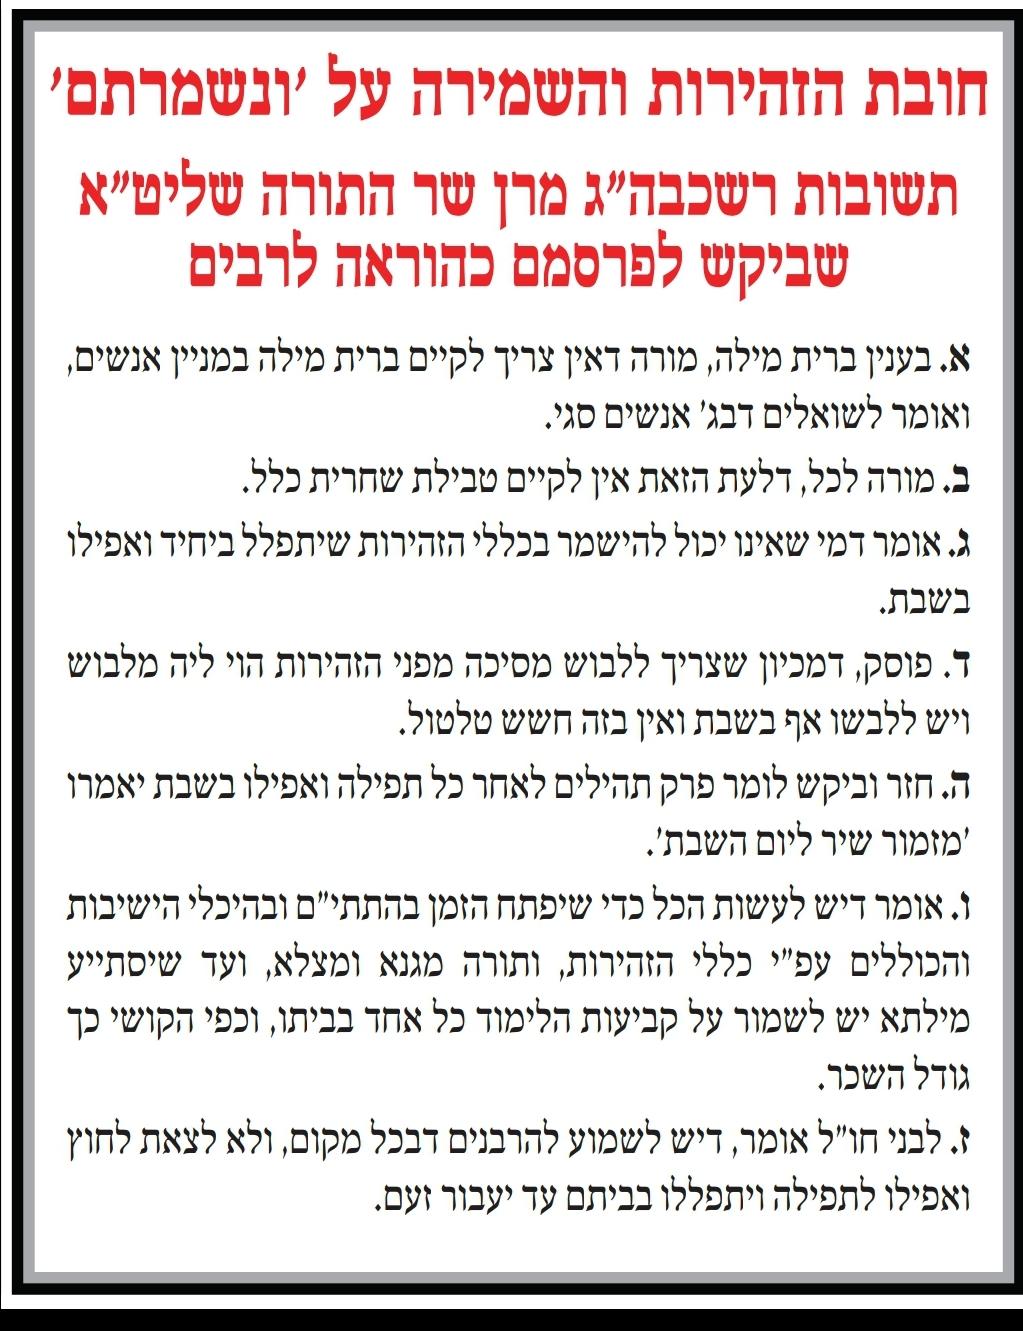 7 New Rulings From Hagaon HaRav Chaim Kanievsky Regarding Coronavirus 2